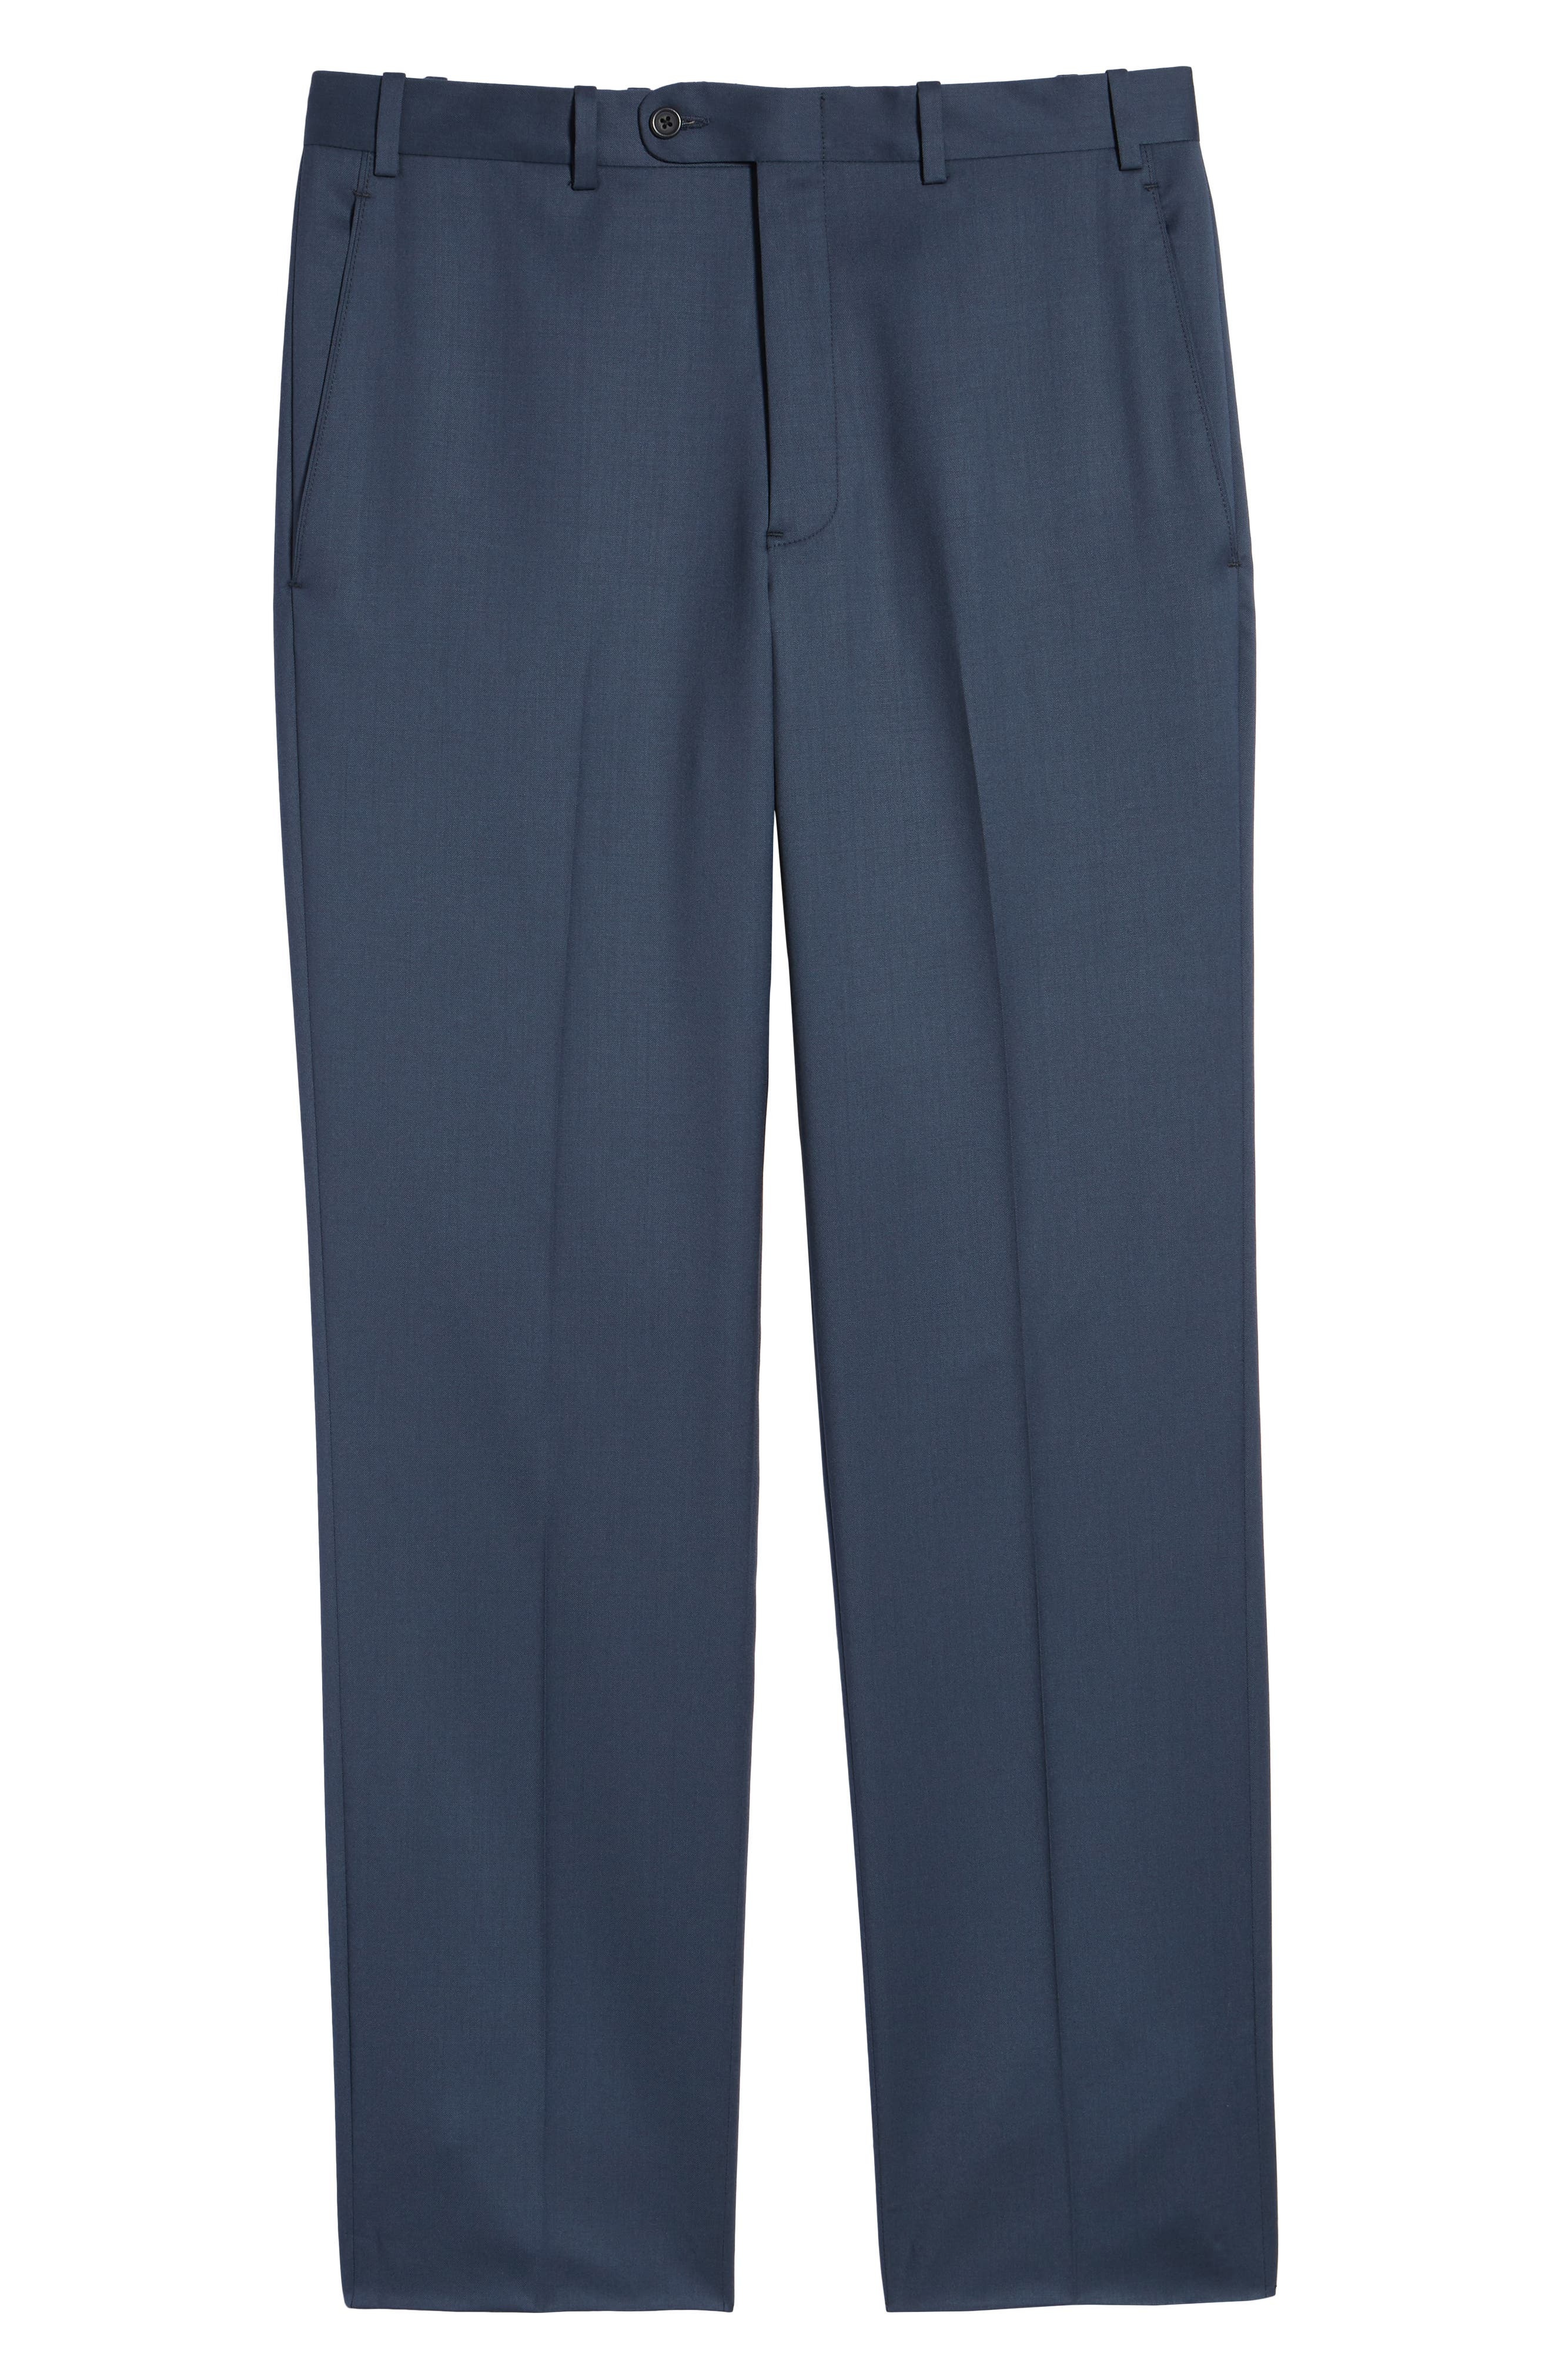 Torino Flat Front Wool Gabardine Trousers,                             Alternate thumbnail 36, color,